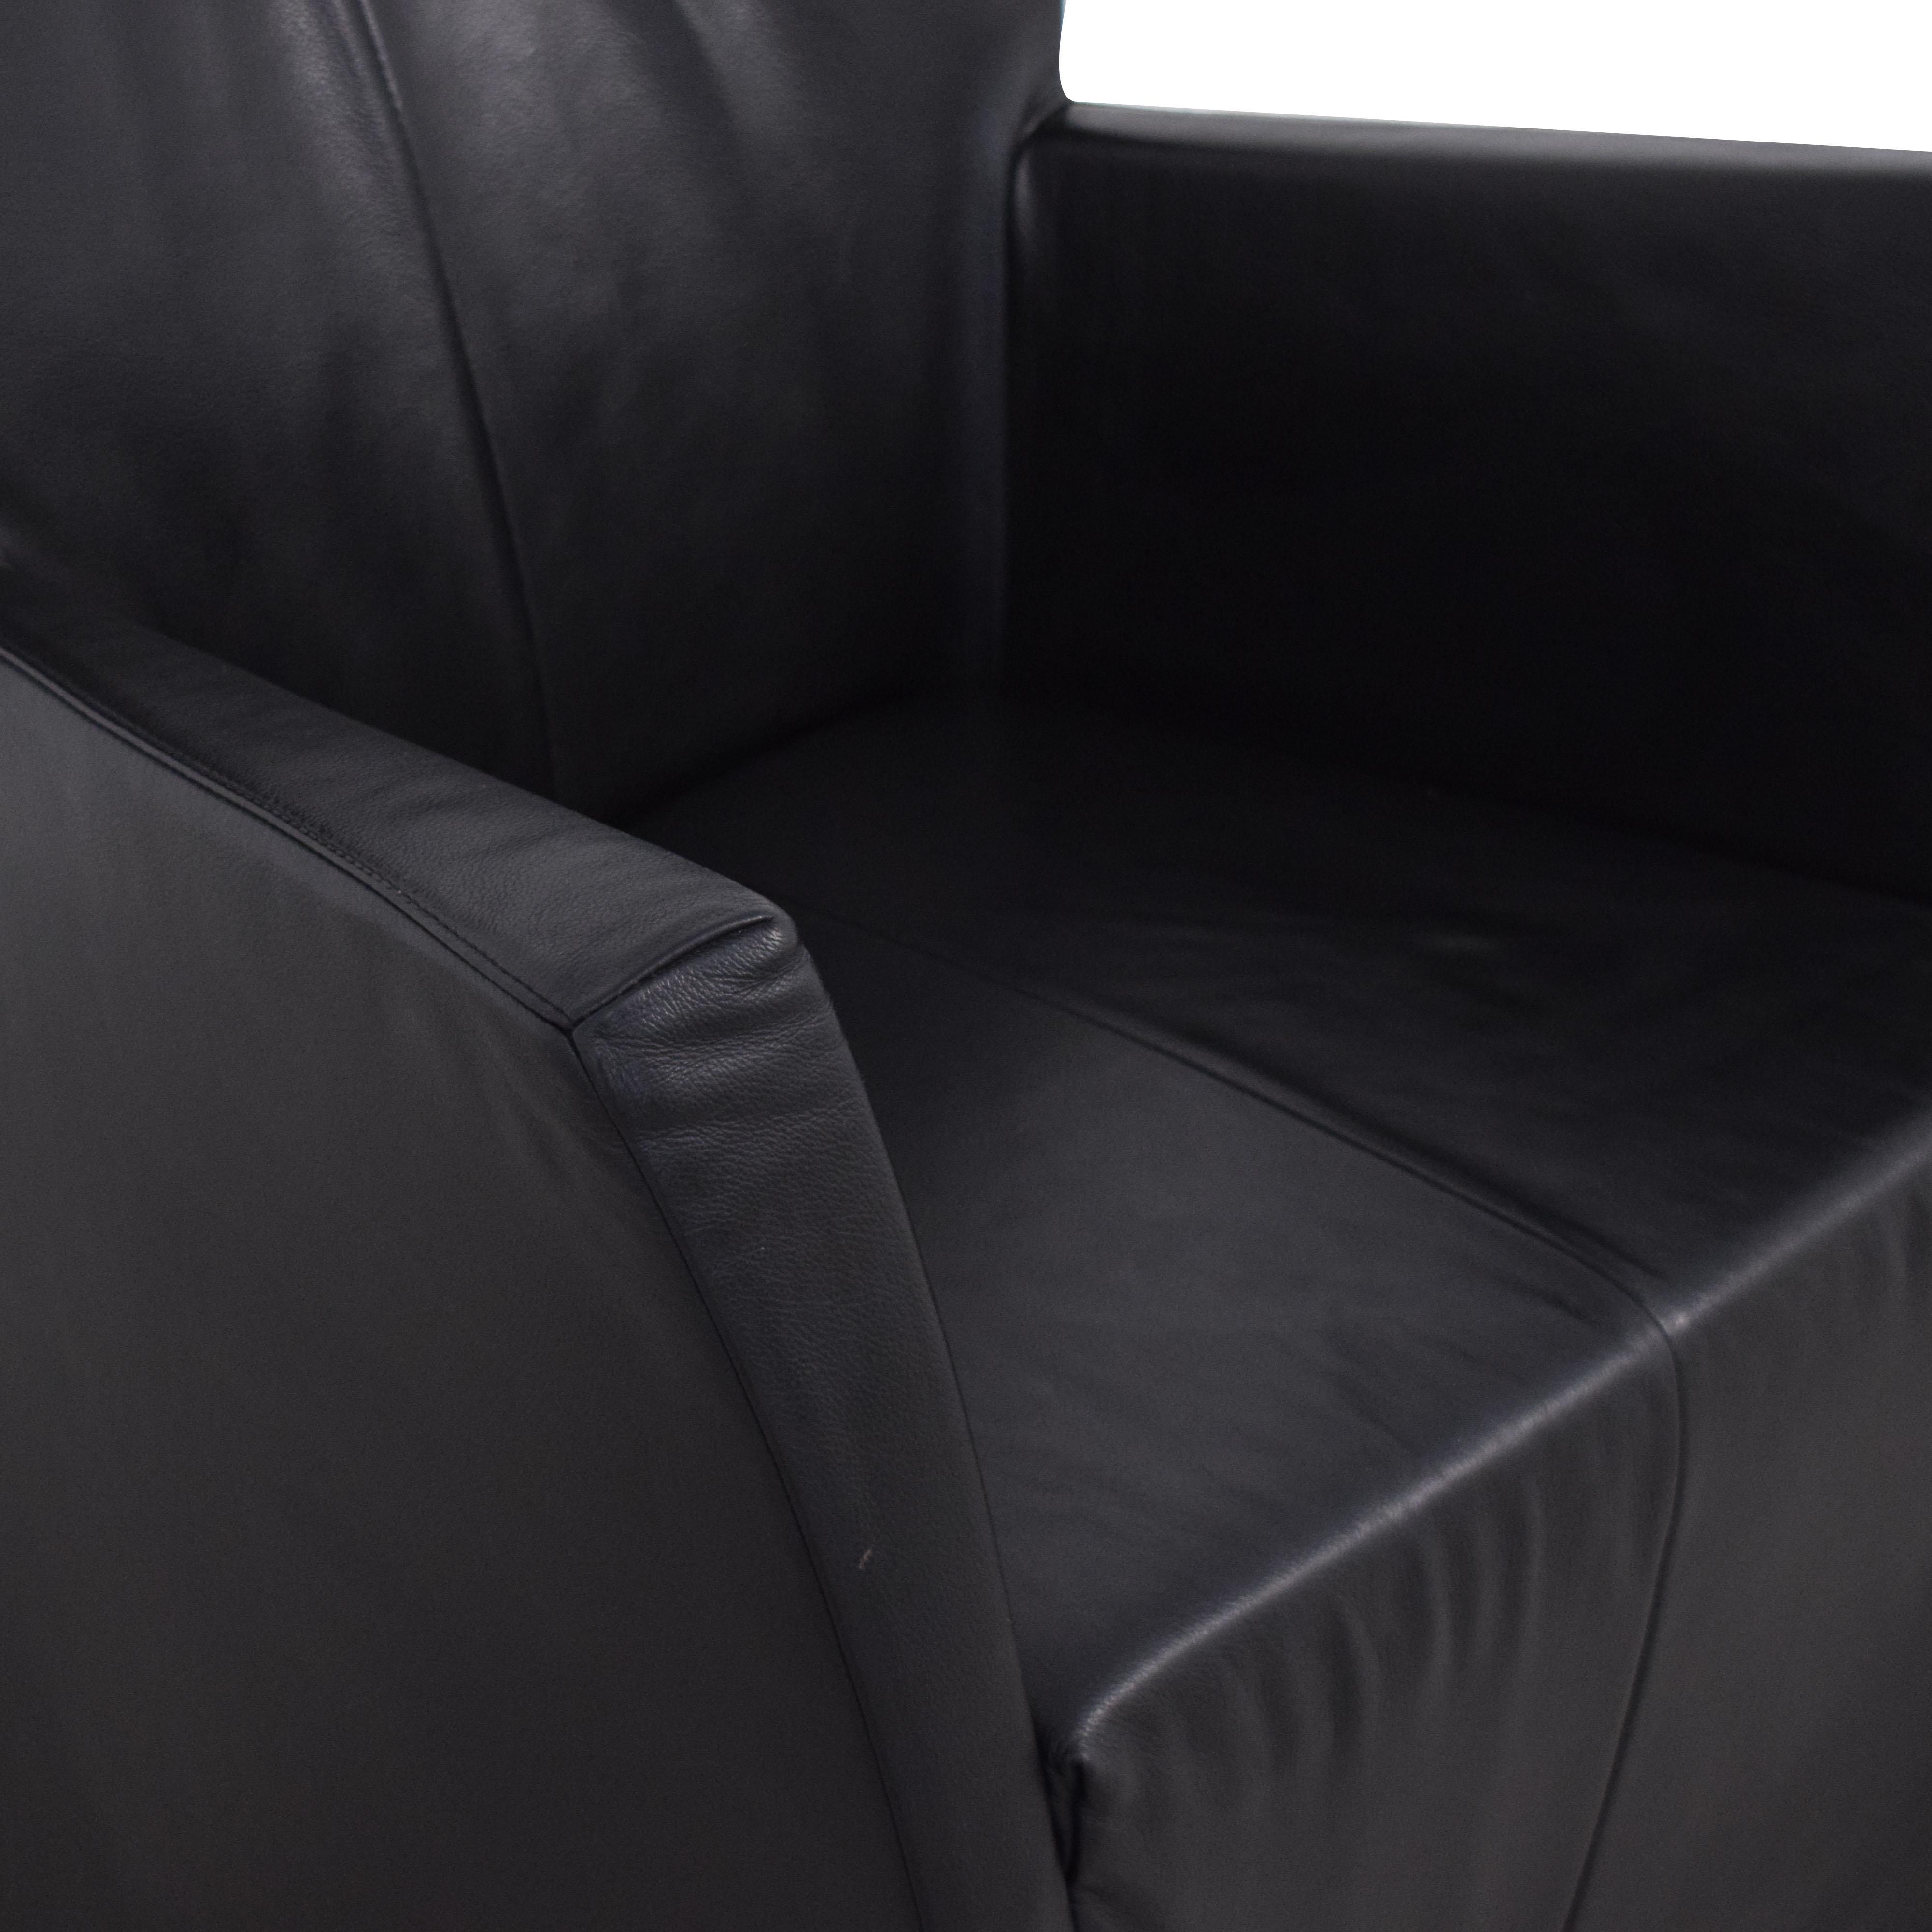 Montis Montis Sting Arm Chair used